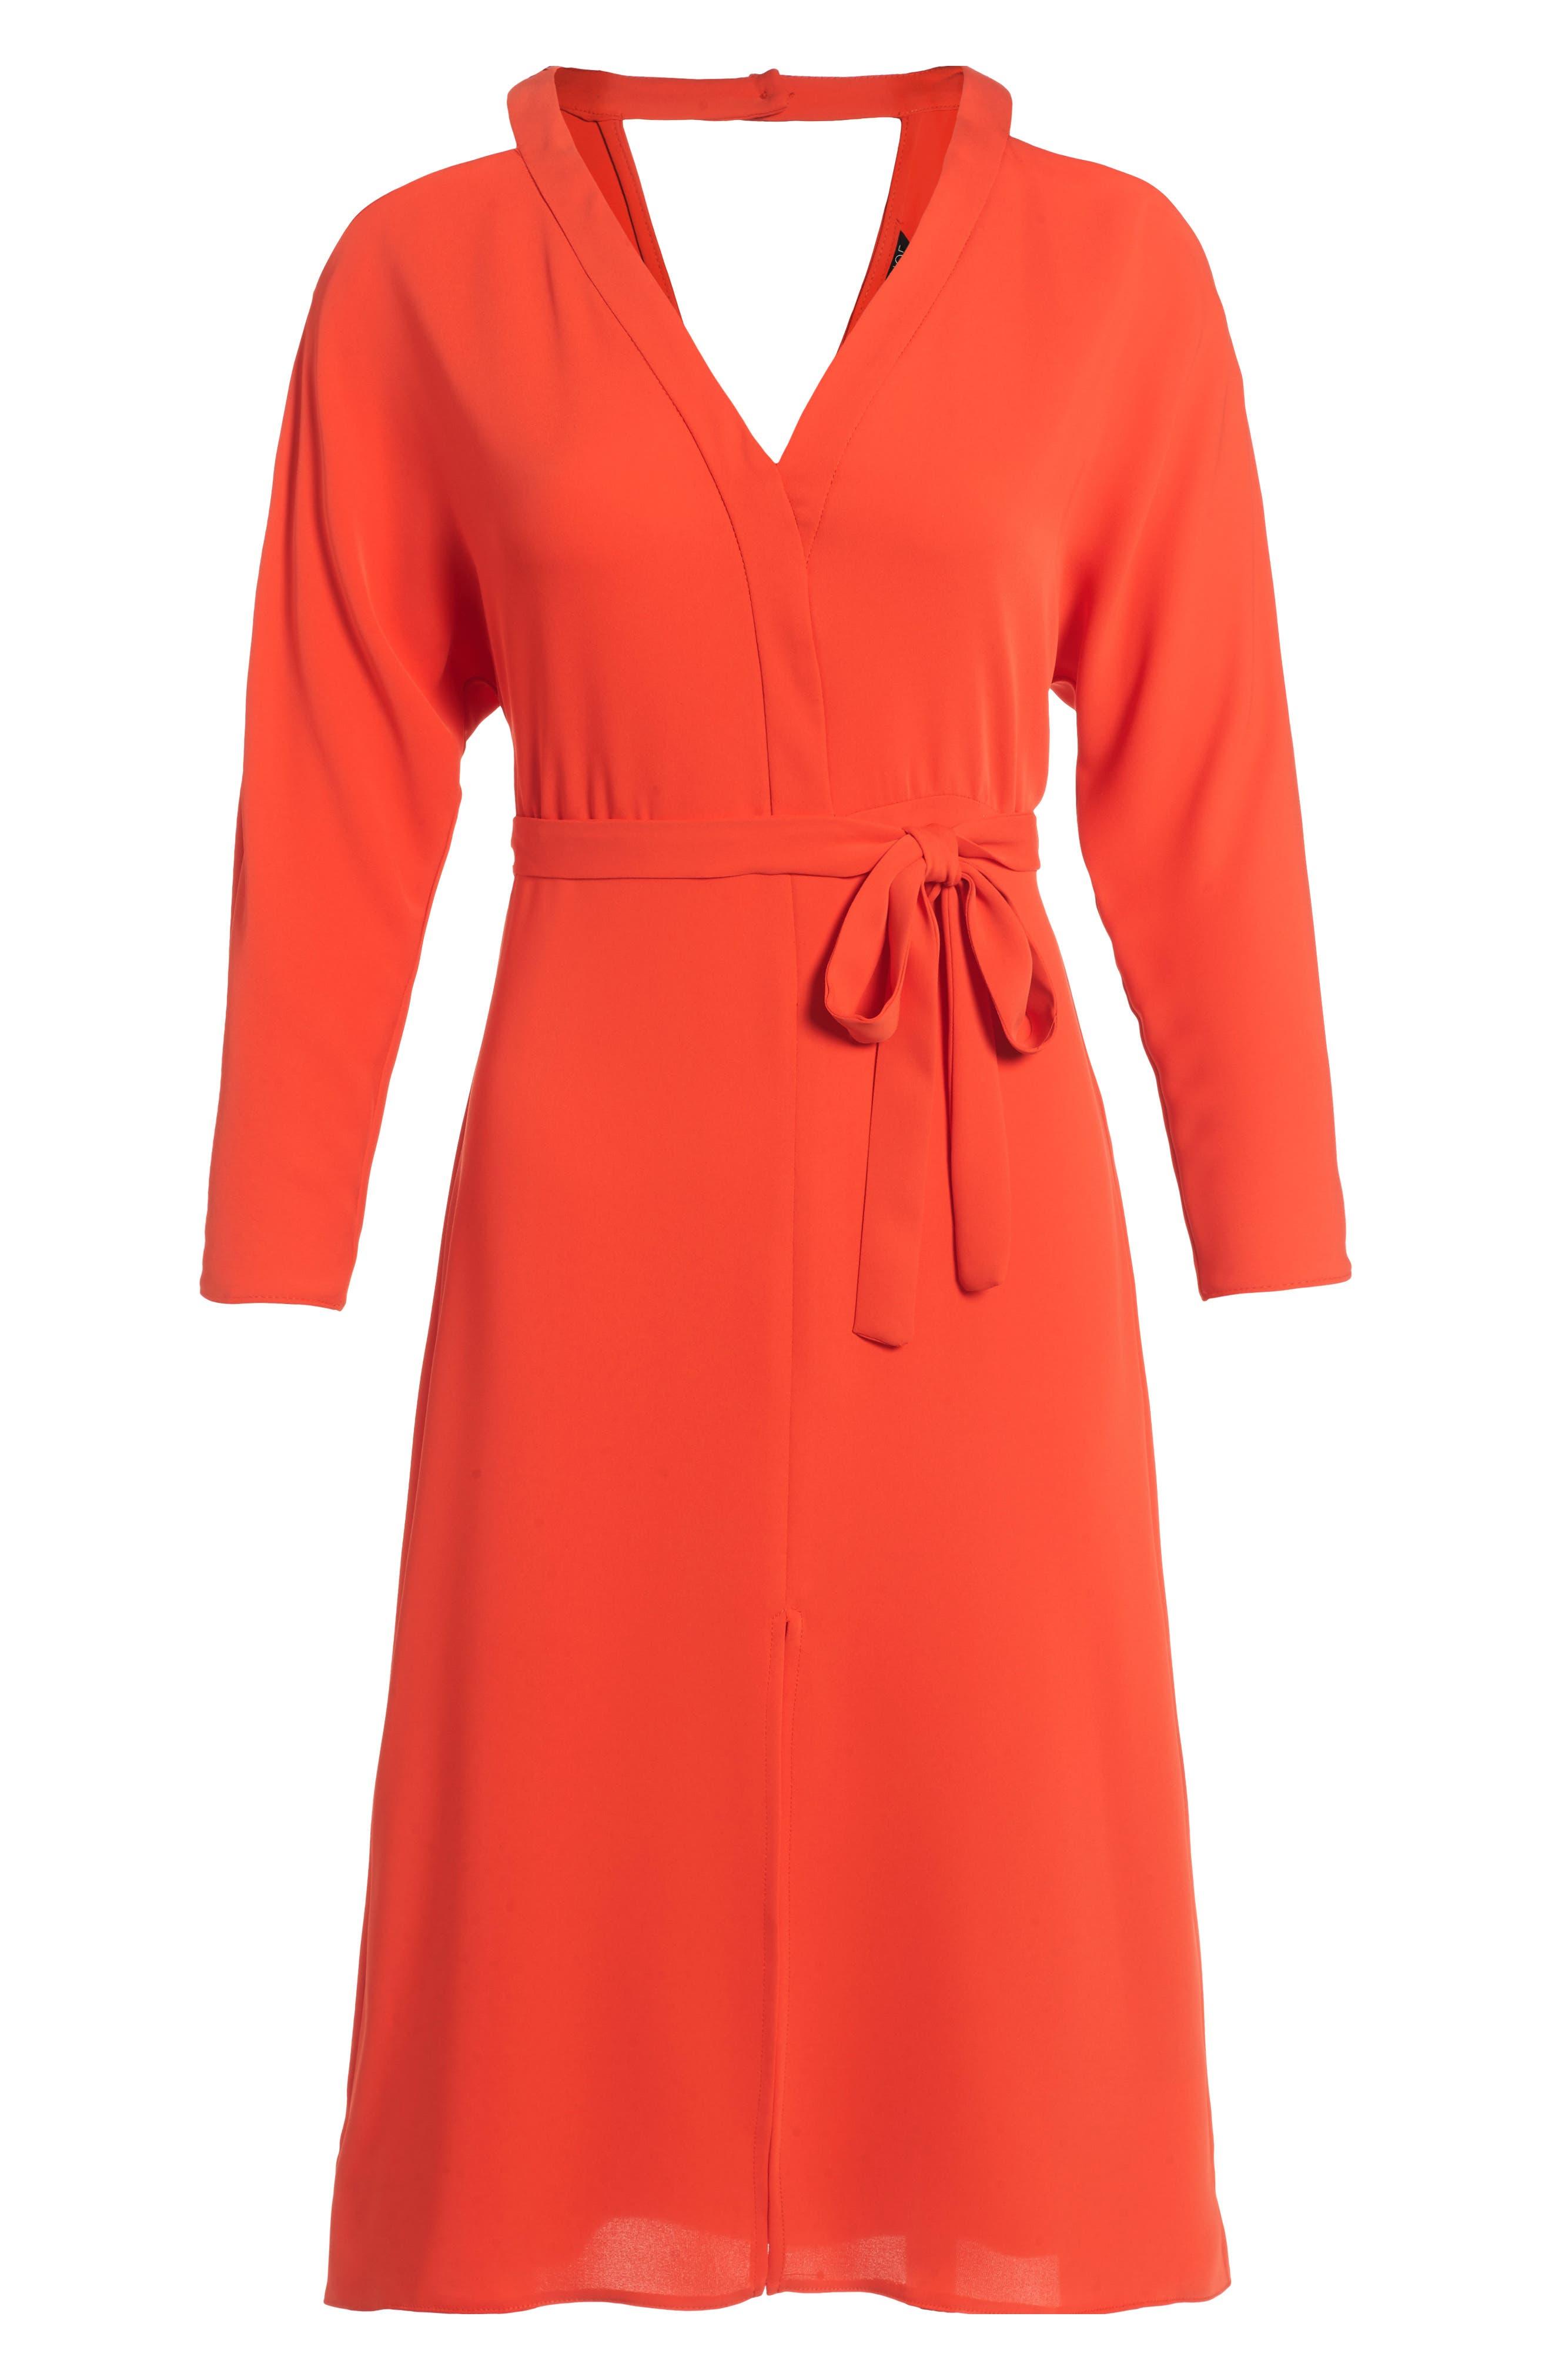 Main Image - Topshop Cutout Cold Shoulder Dress